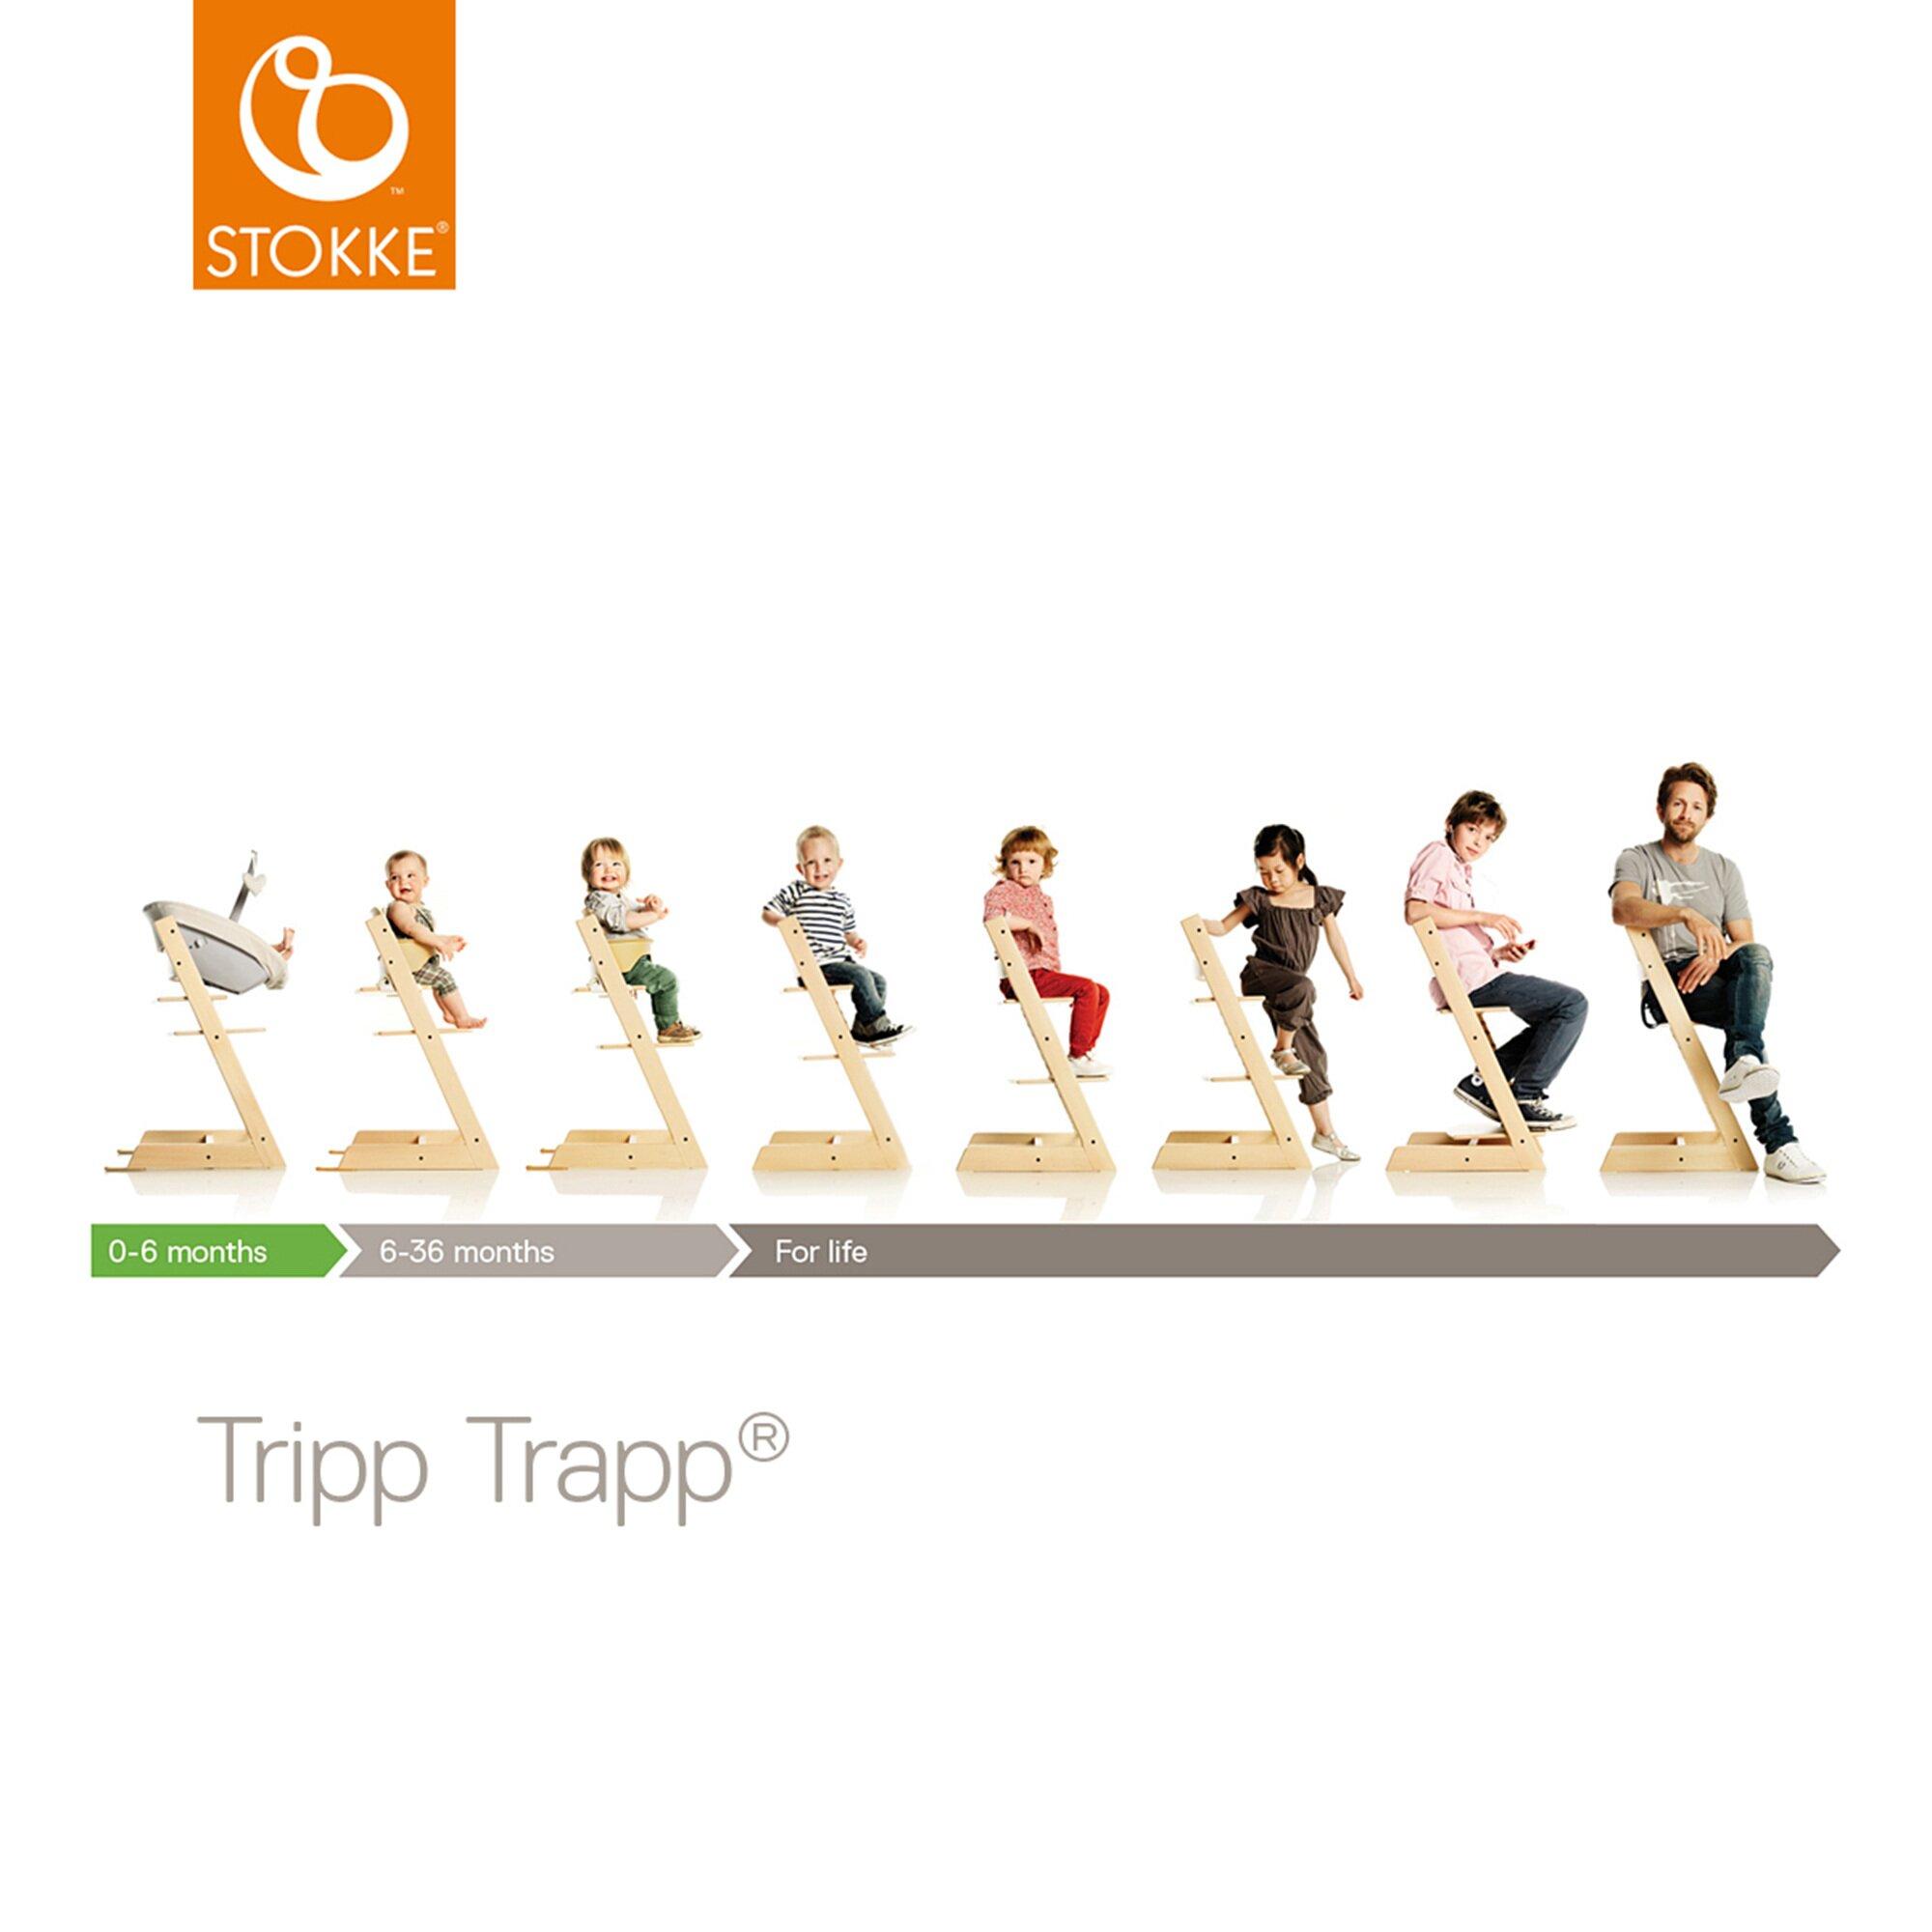 tripp-trapp-treppenhochstuhl, 179.00 EUR @ babywalz-de